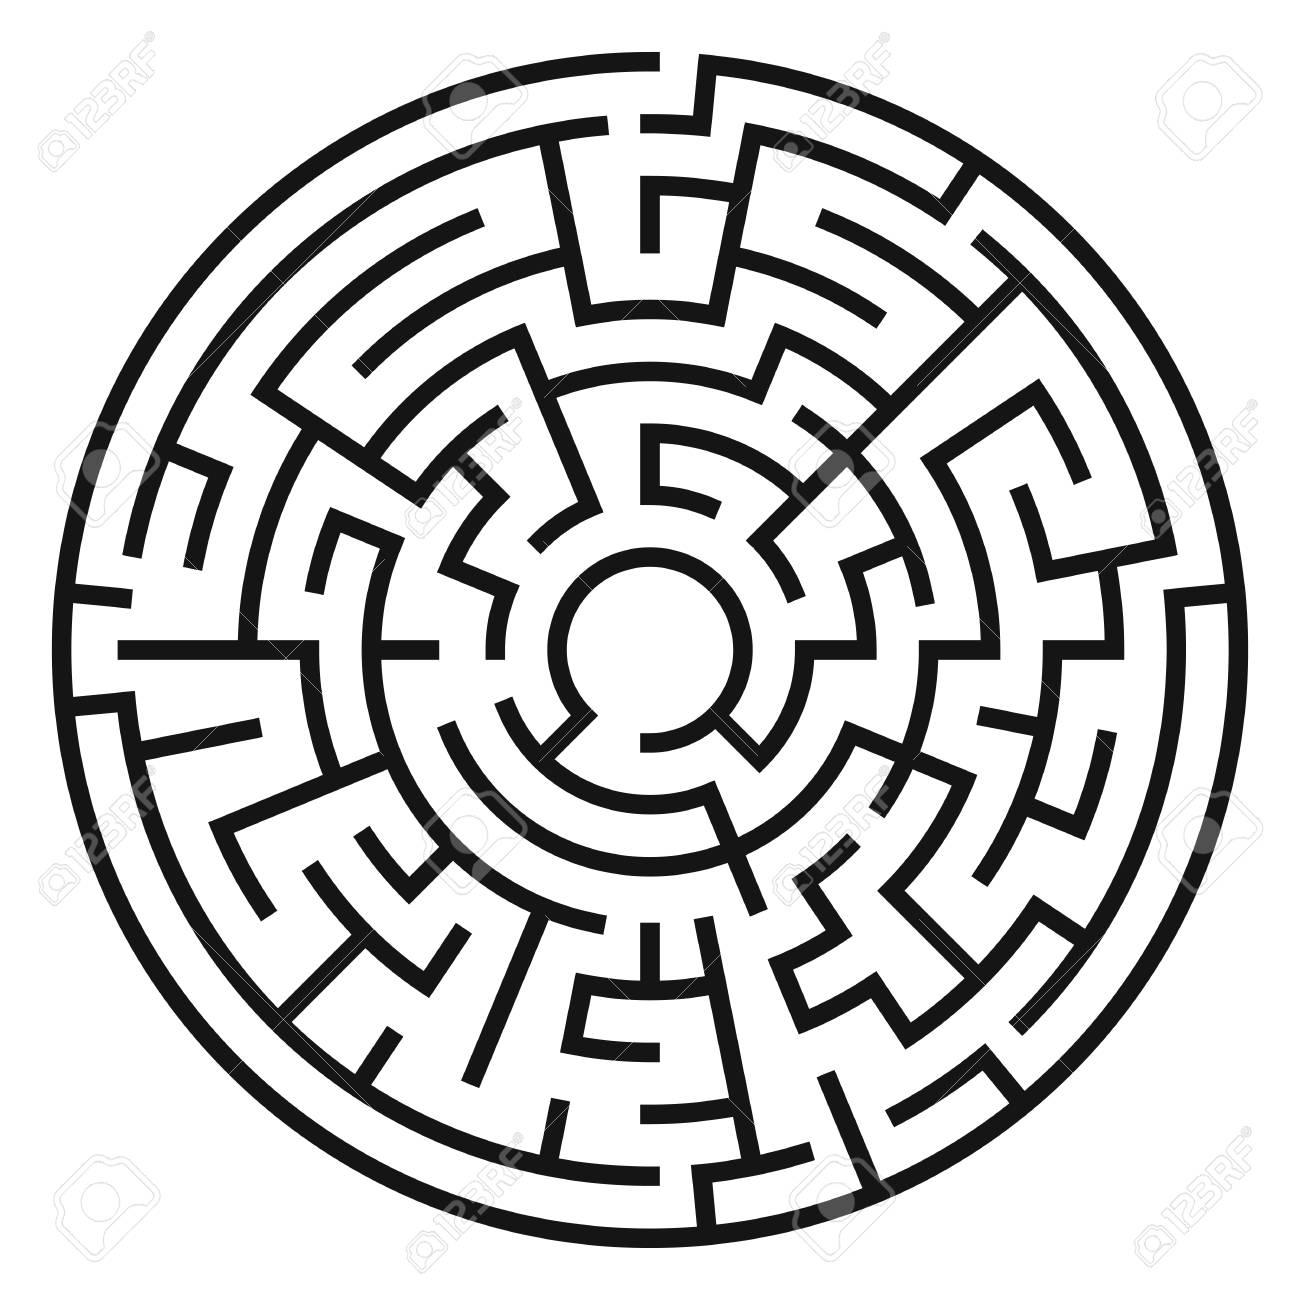 Free clipart maze. Circle download clip art